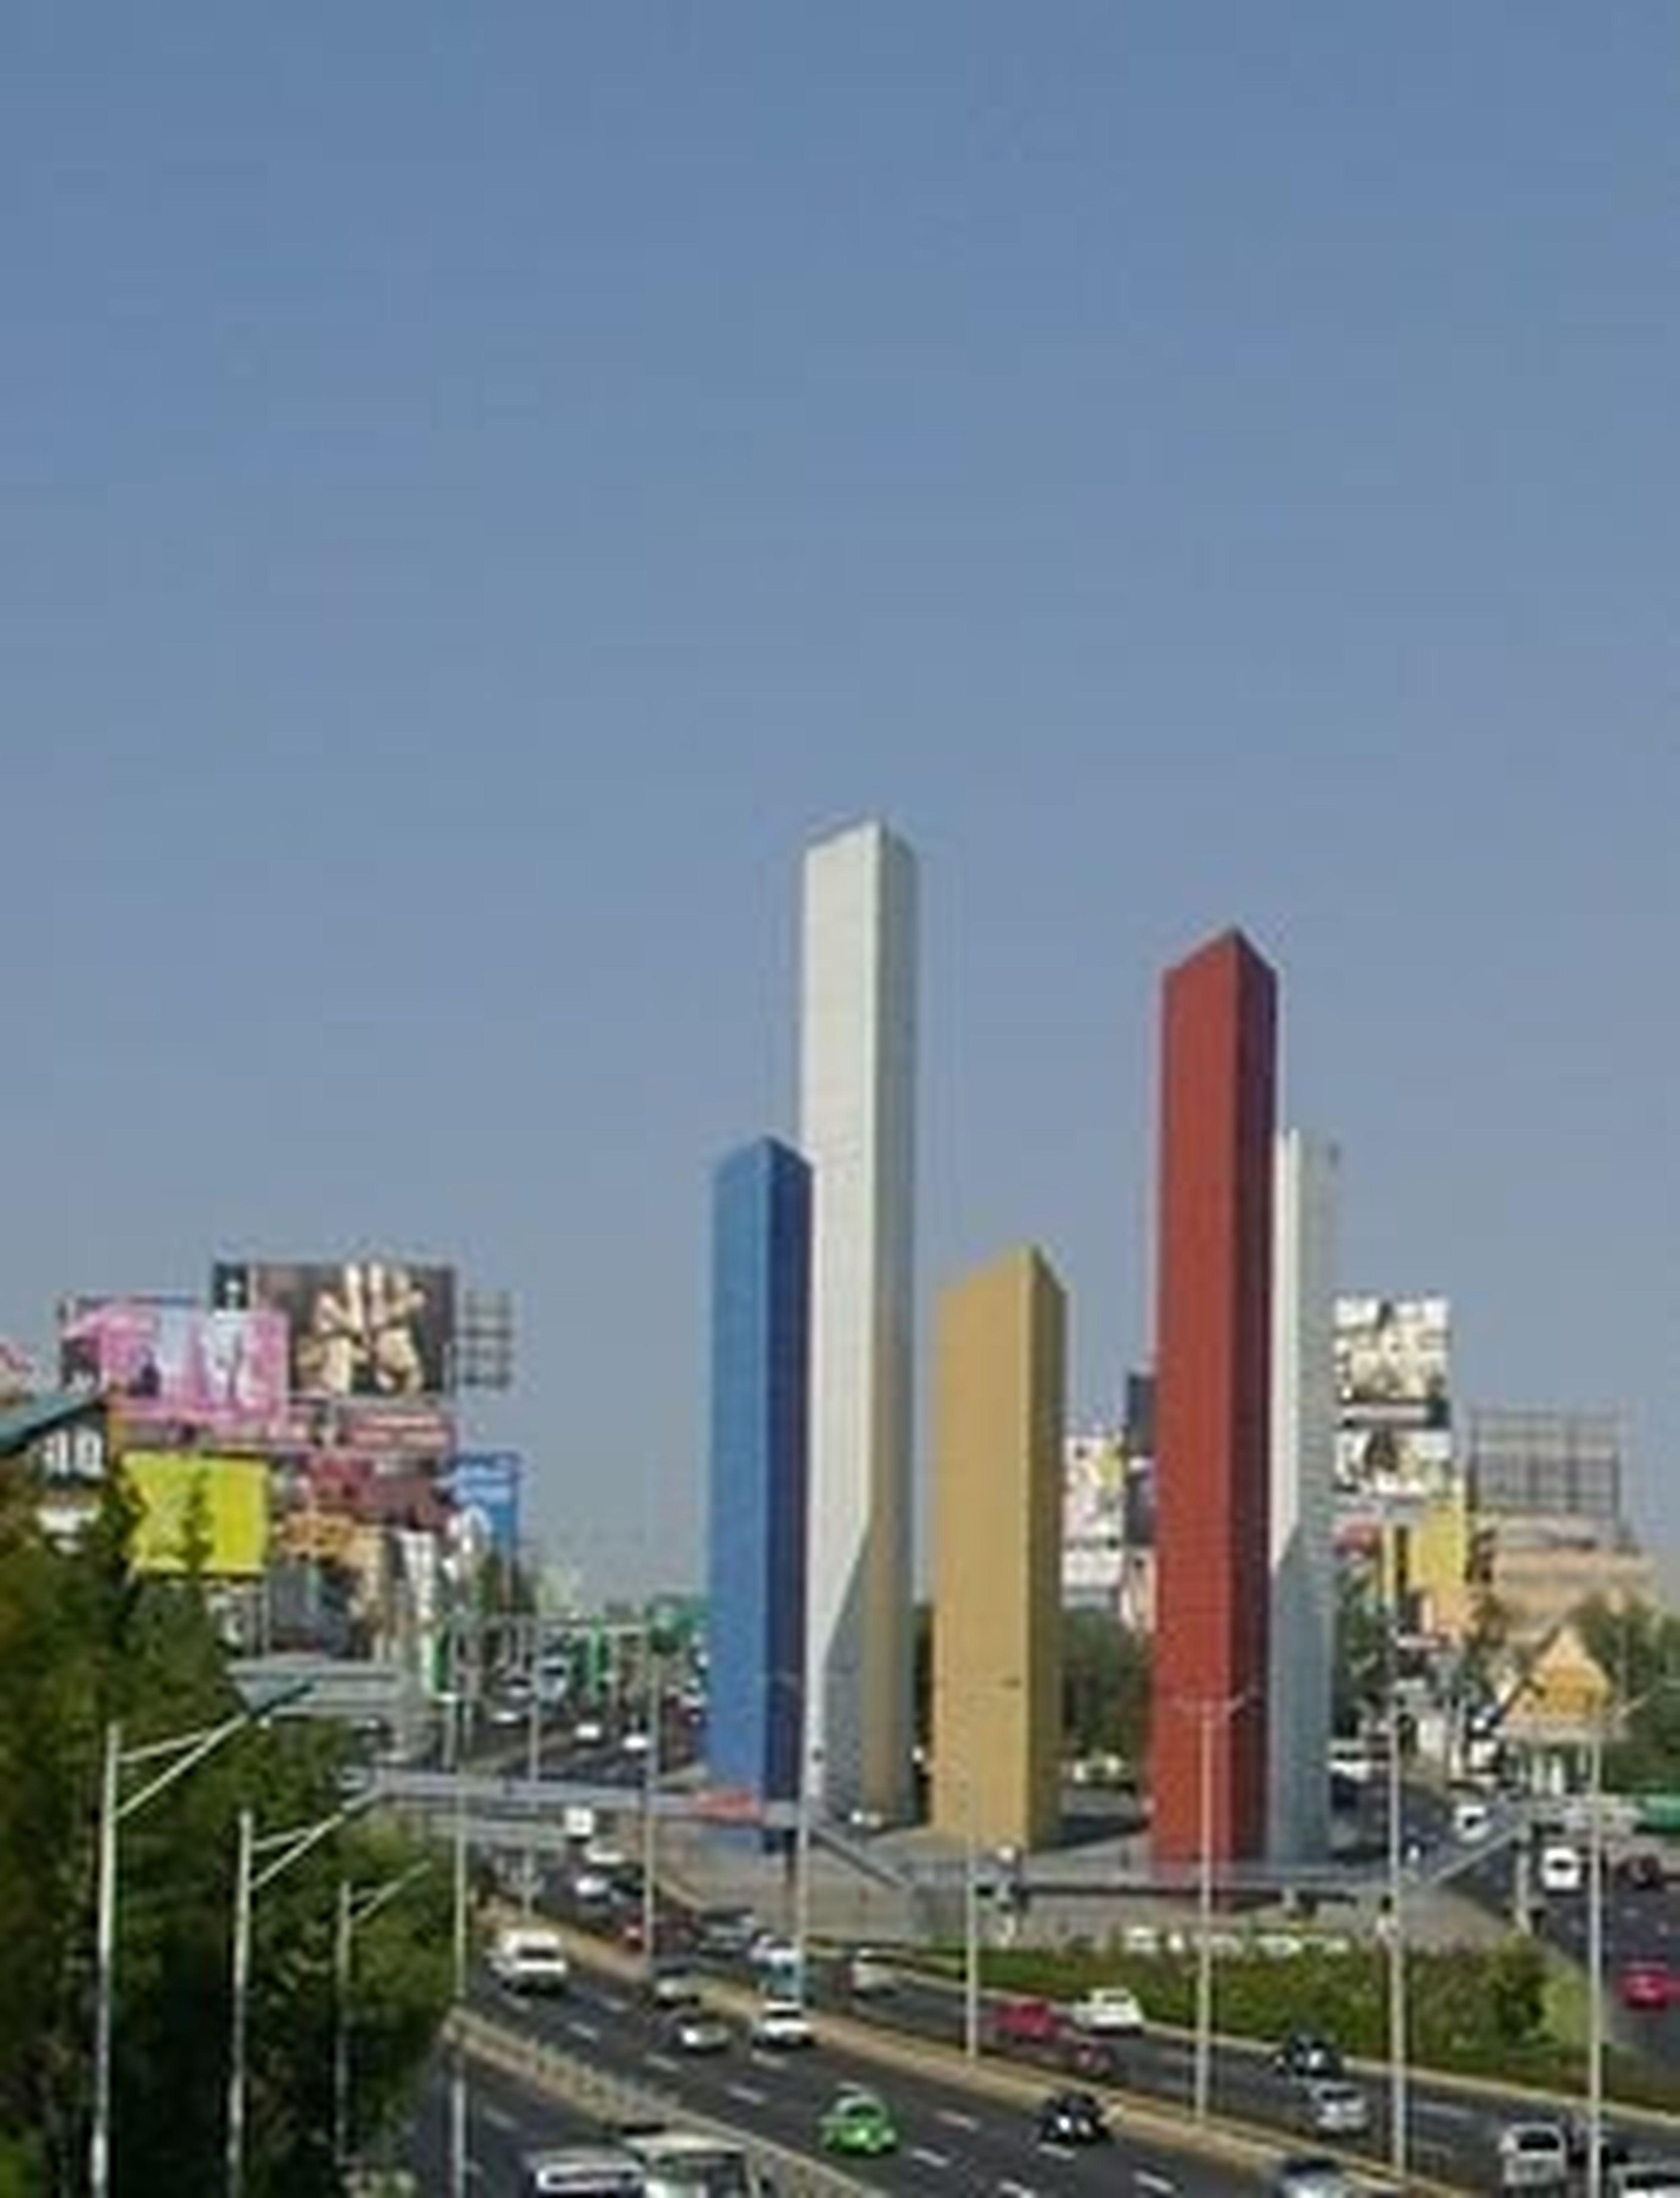 Ciudad de México satélite Naucalpan estado D.F